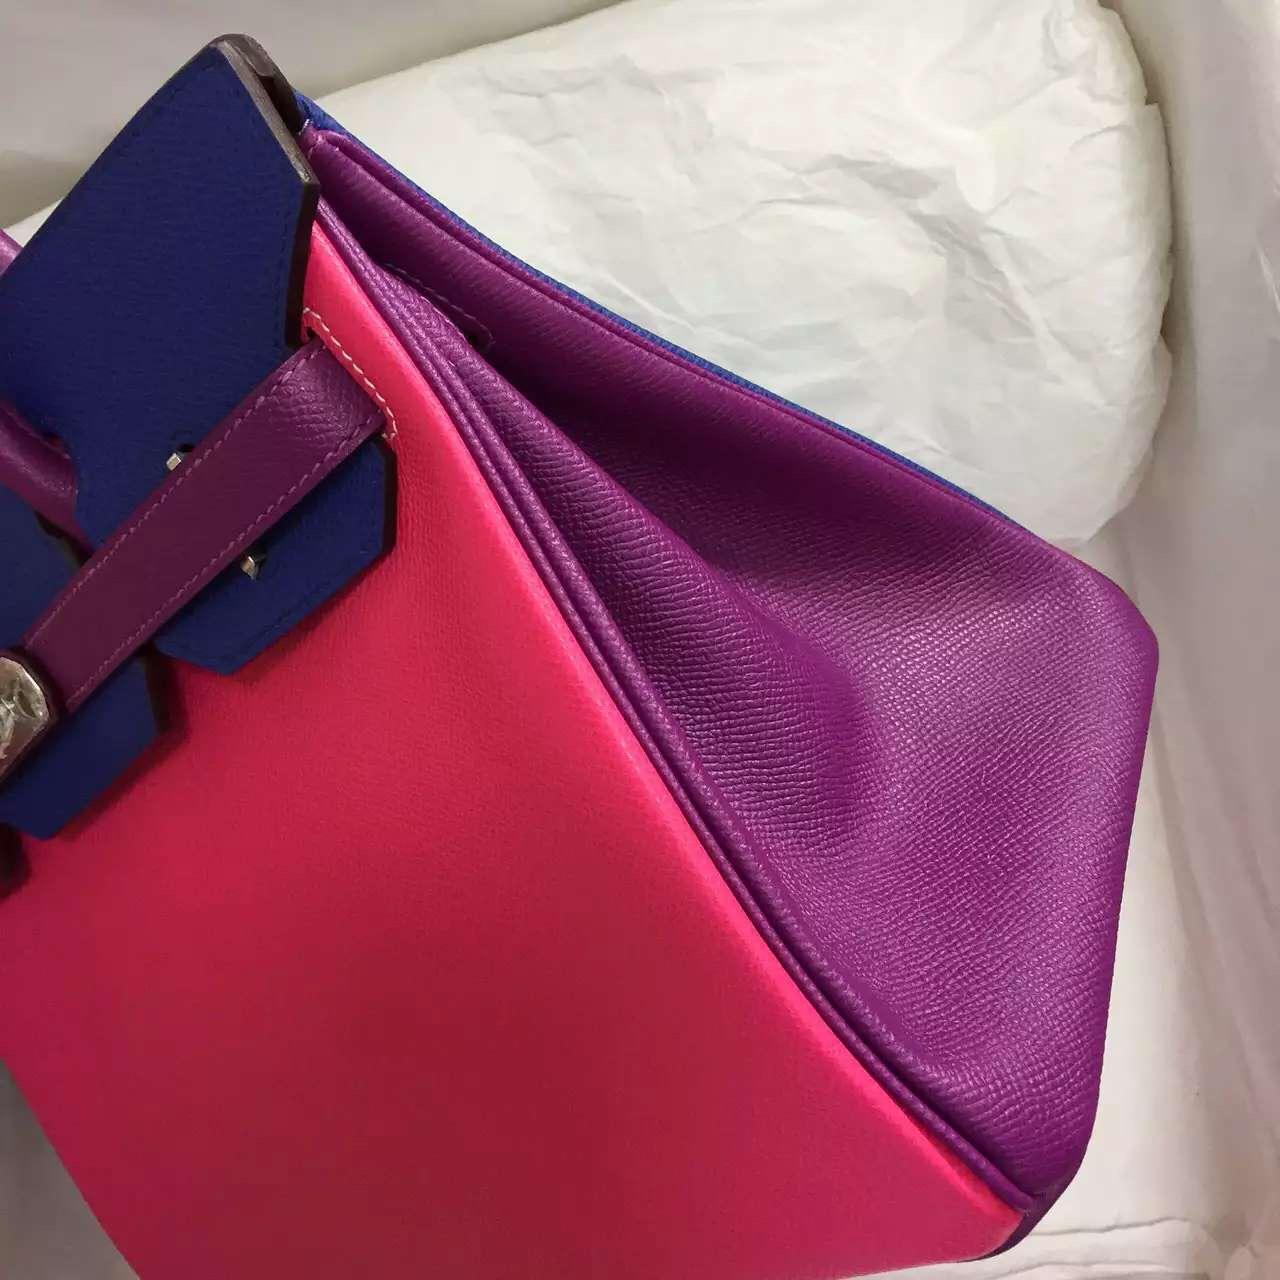 Cheap Hermes Color Blocking Epsom Calfskin Leather Birkin Bag 30CM Women's Tote Bag